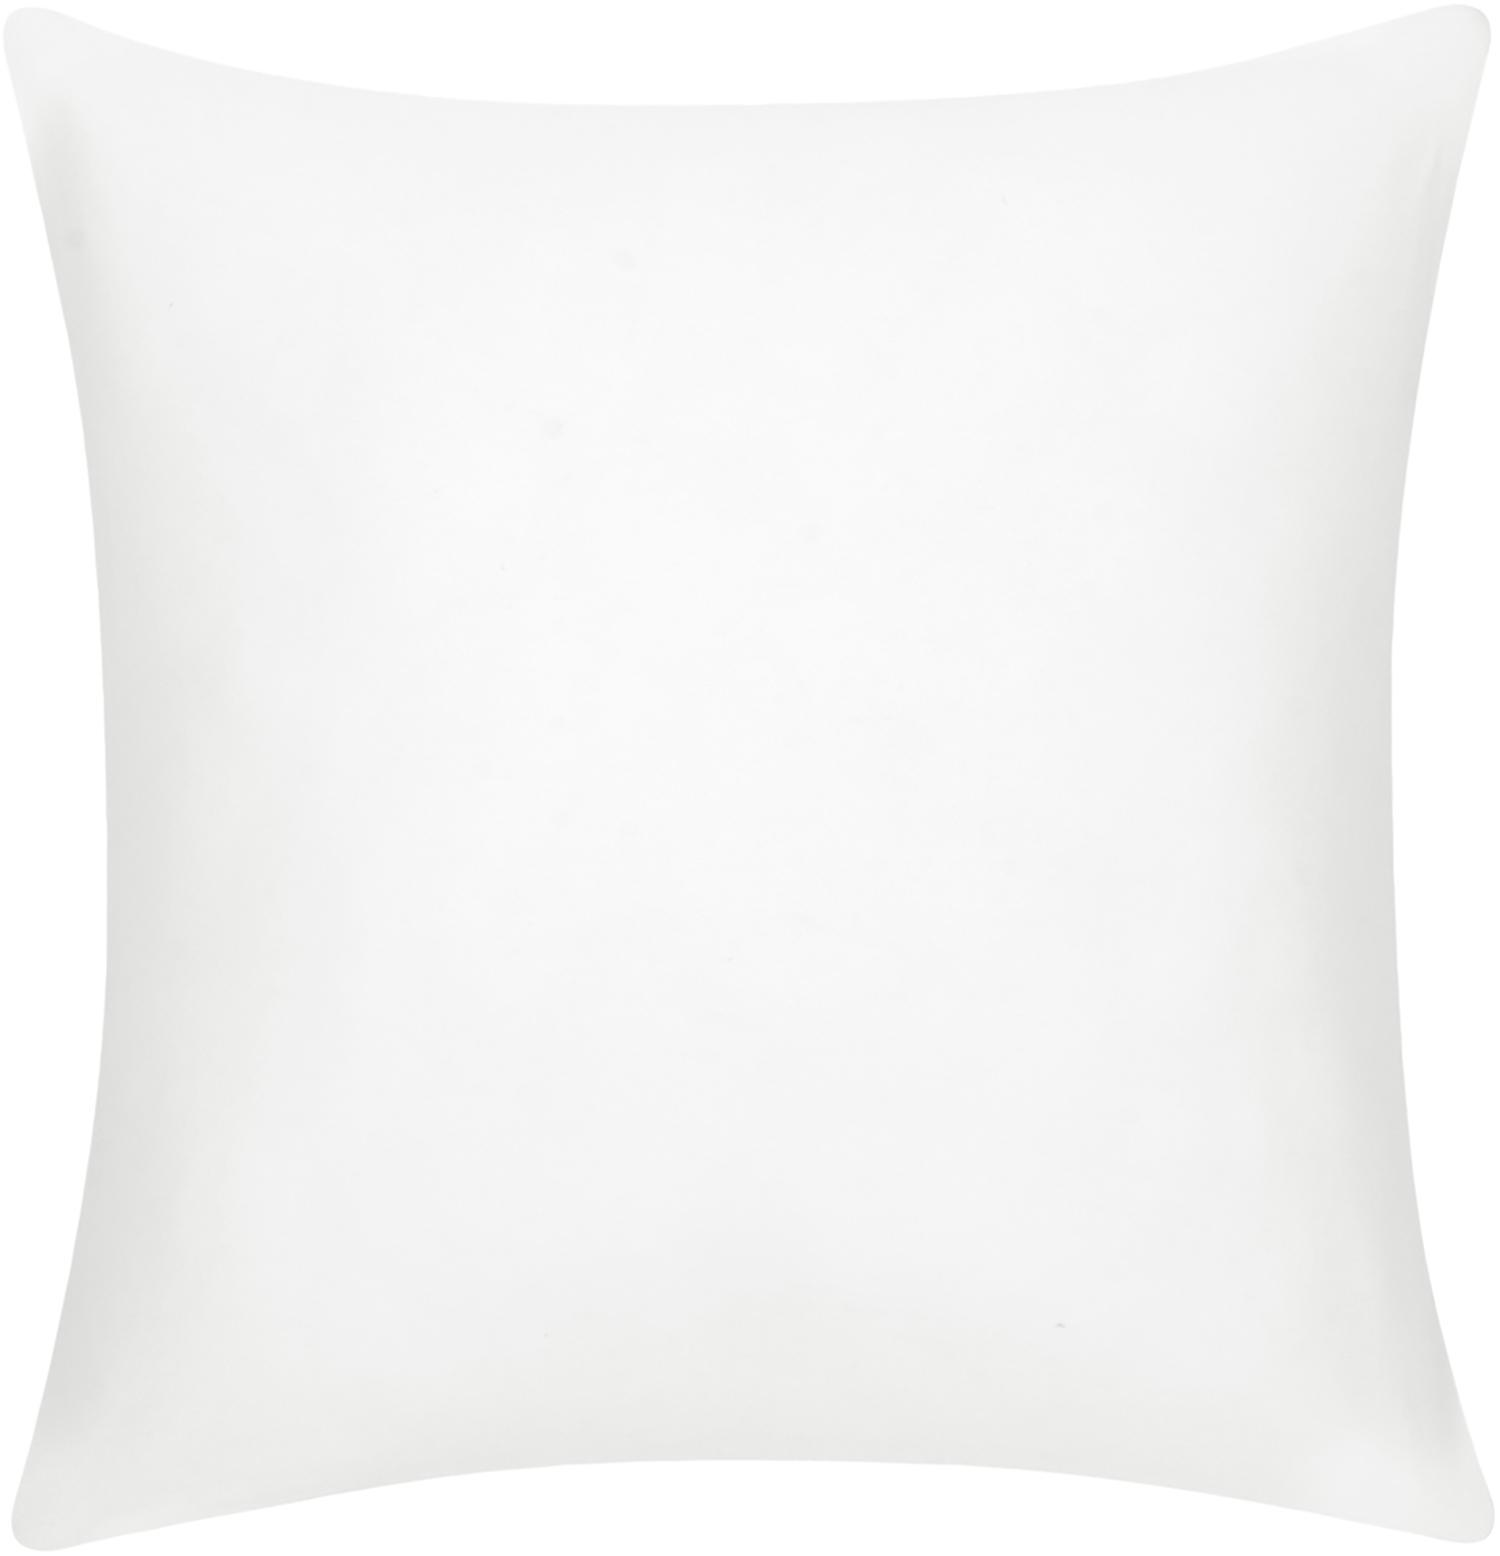 Funda de cojín de algodón Mads, Algodón, Blanco, An 40 x L 40 cm